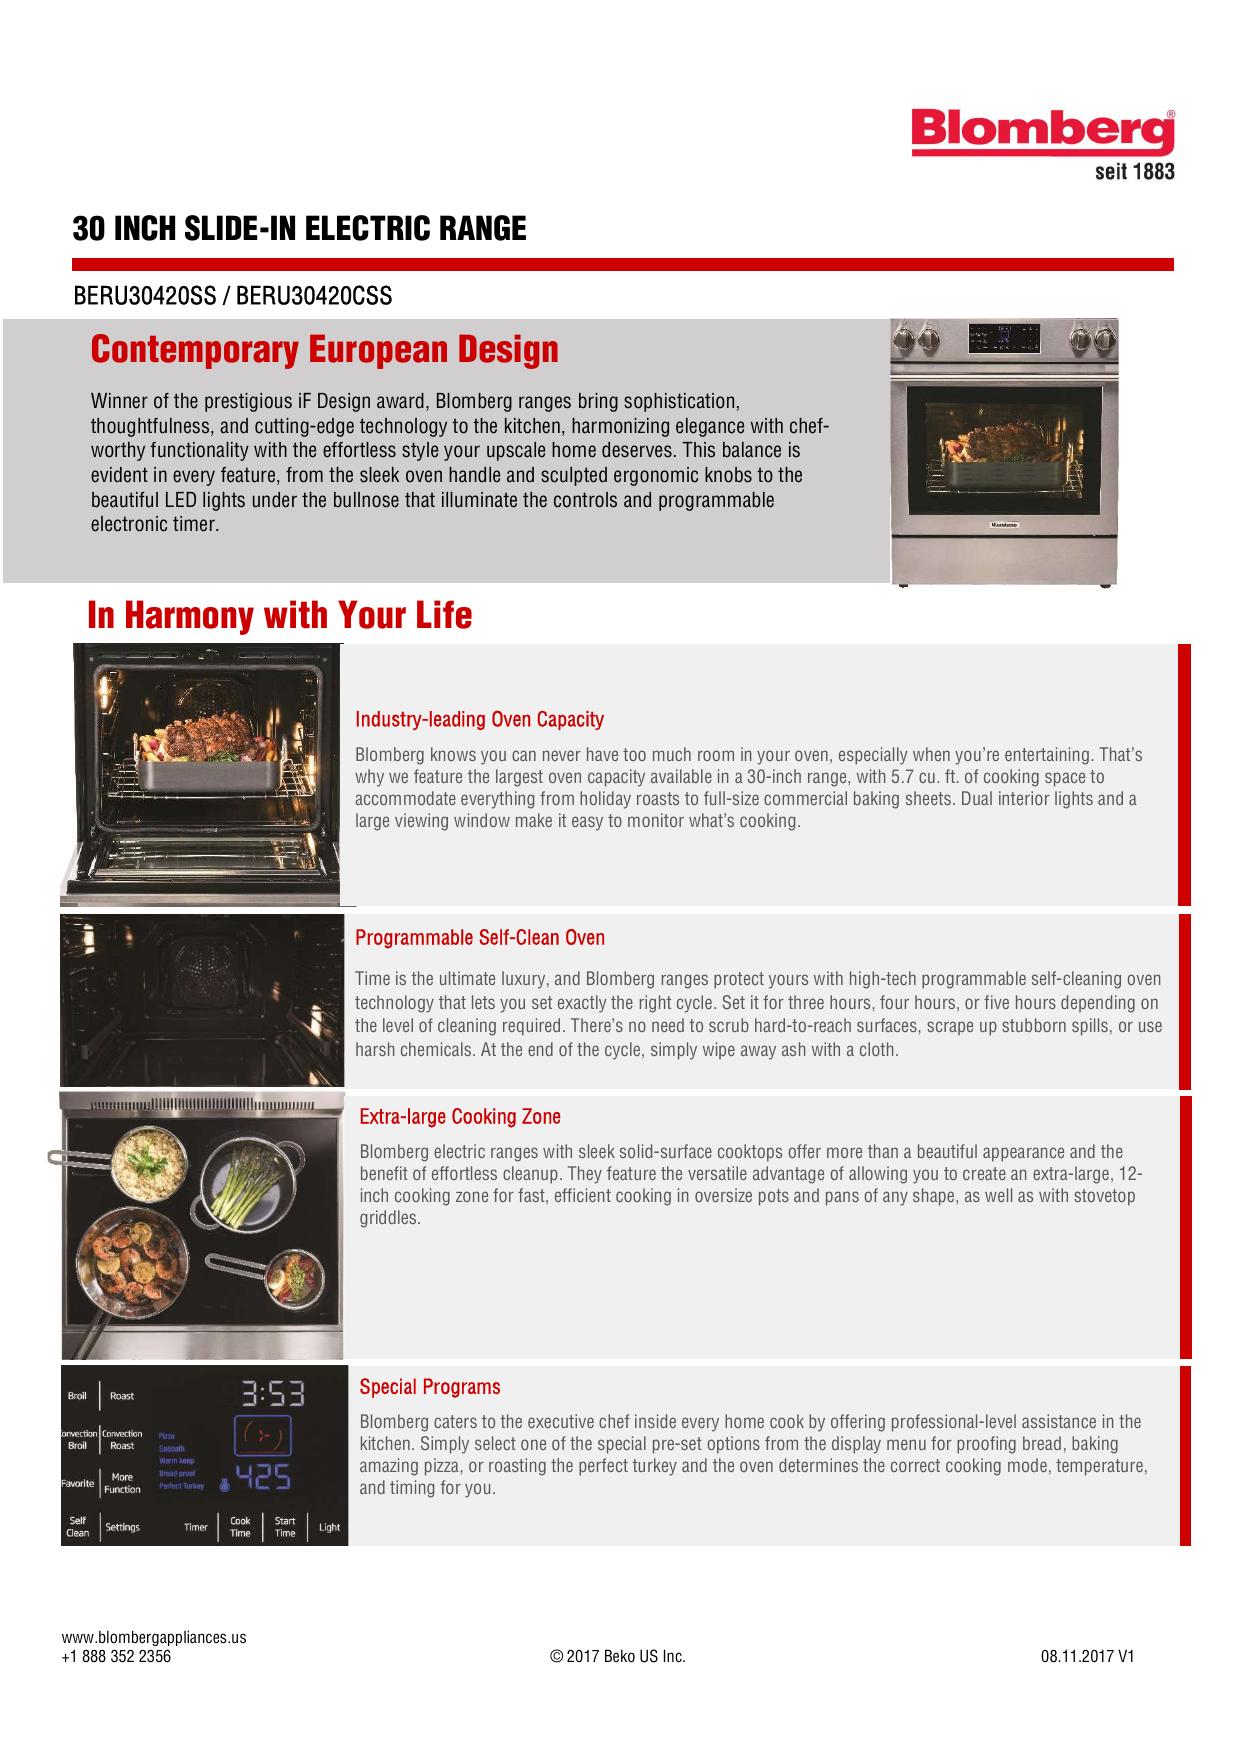 blomberg single oven manual zeit magazin partnersuche